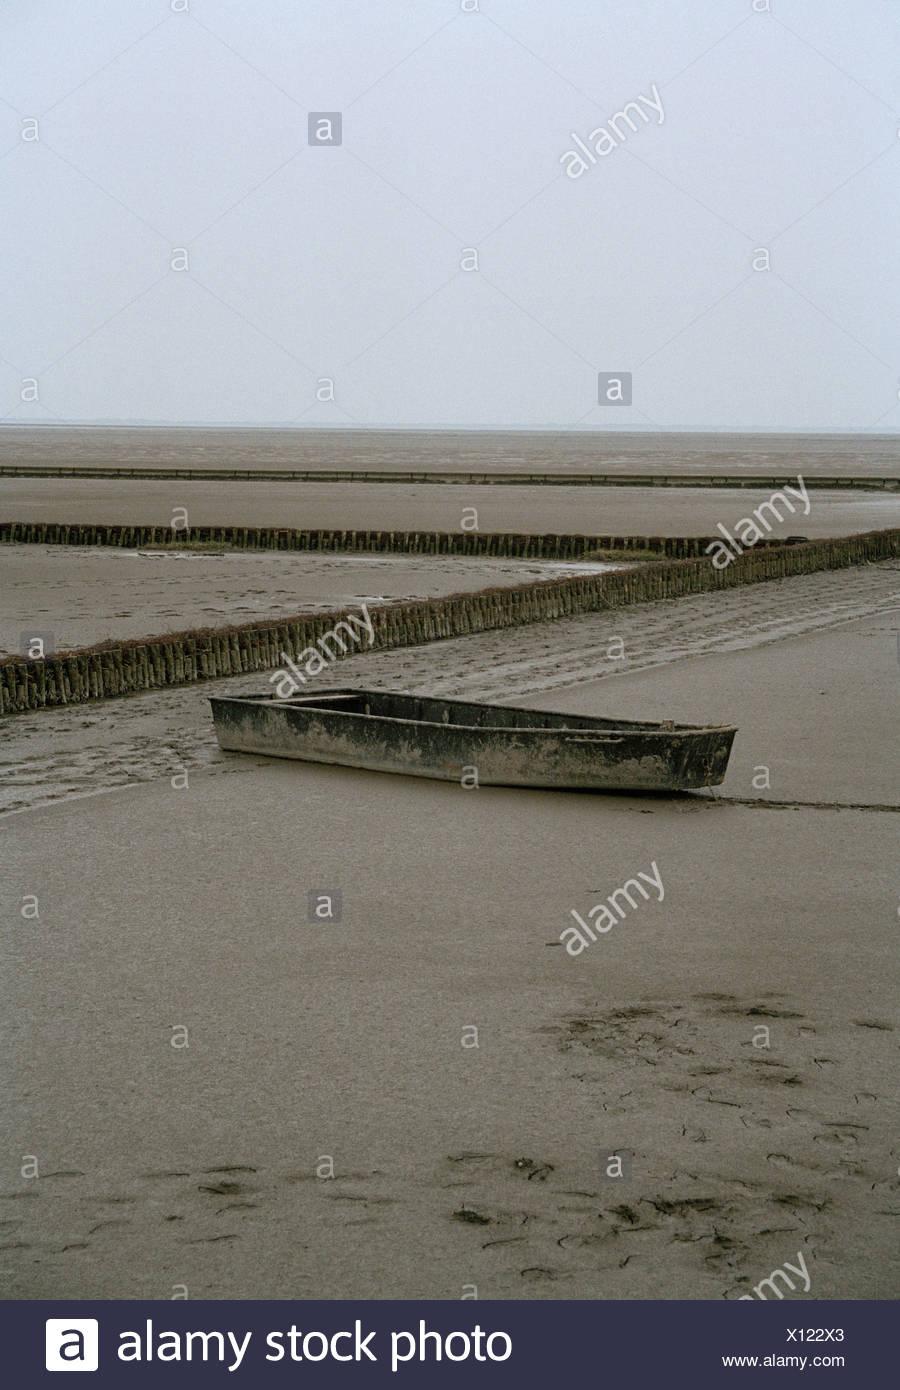 Boat stuck on beach shore Stock Photo: 276026747 - Alamy